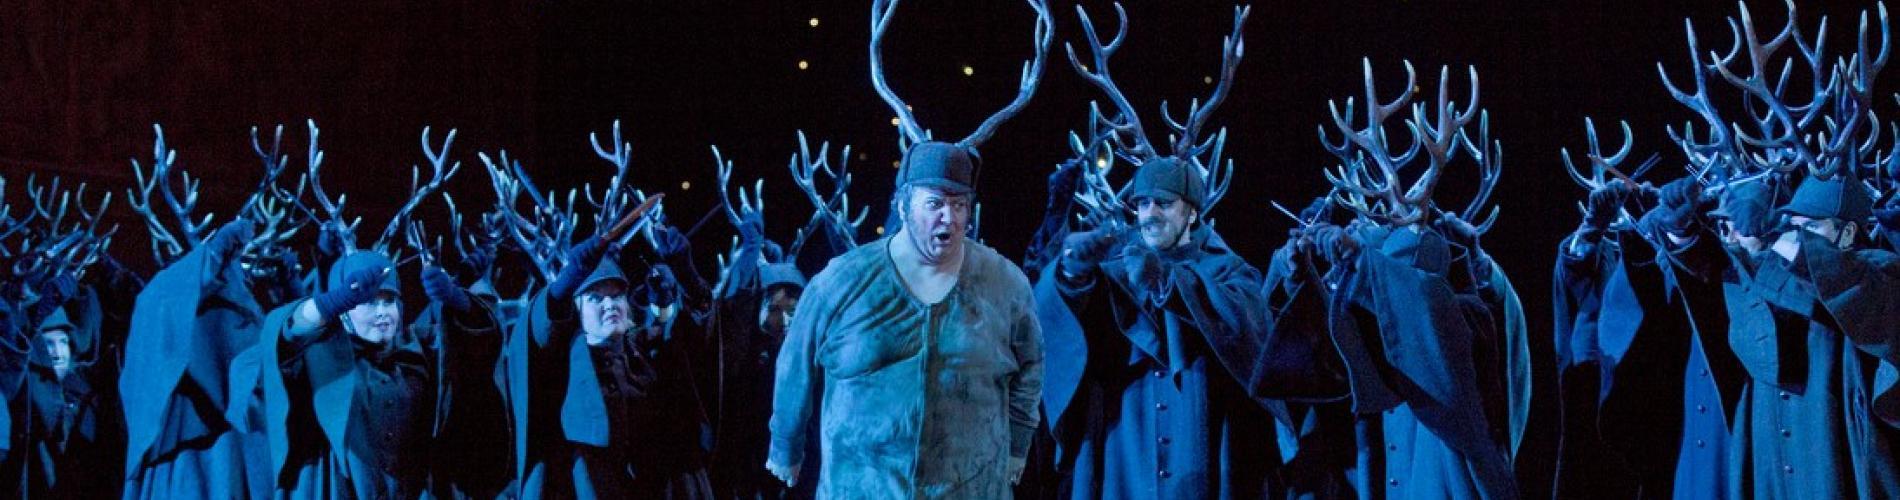 Falstaff at the Met - Photo: © ken howard/Metropolitan Opera